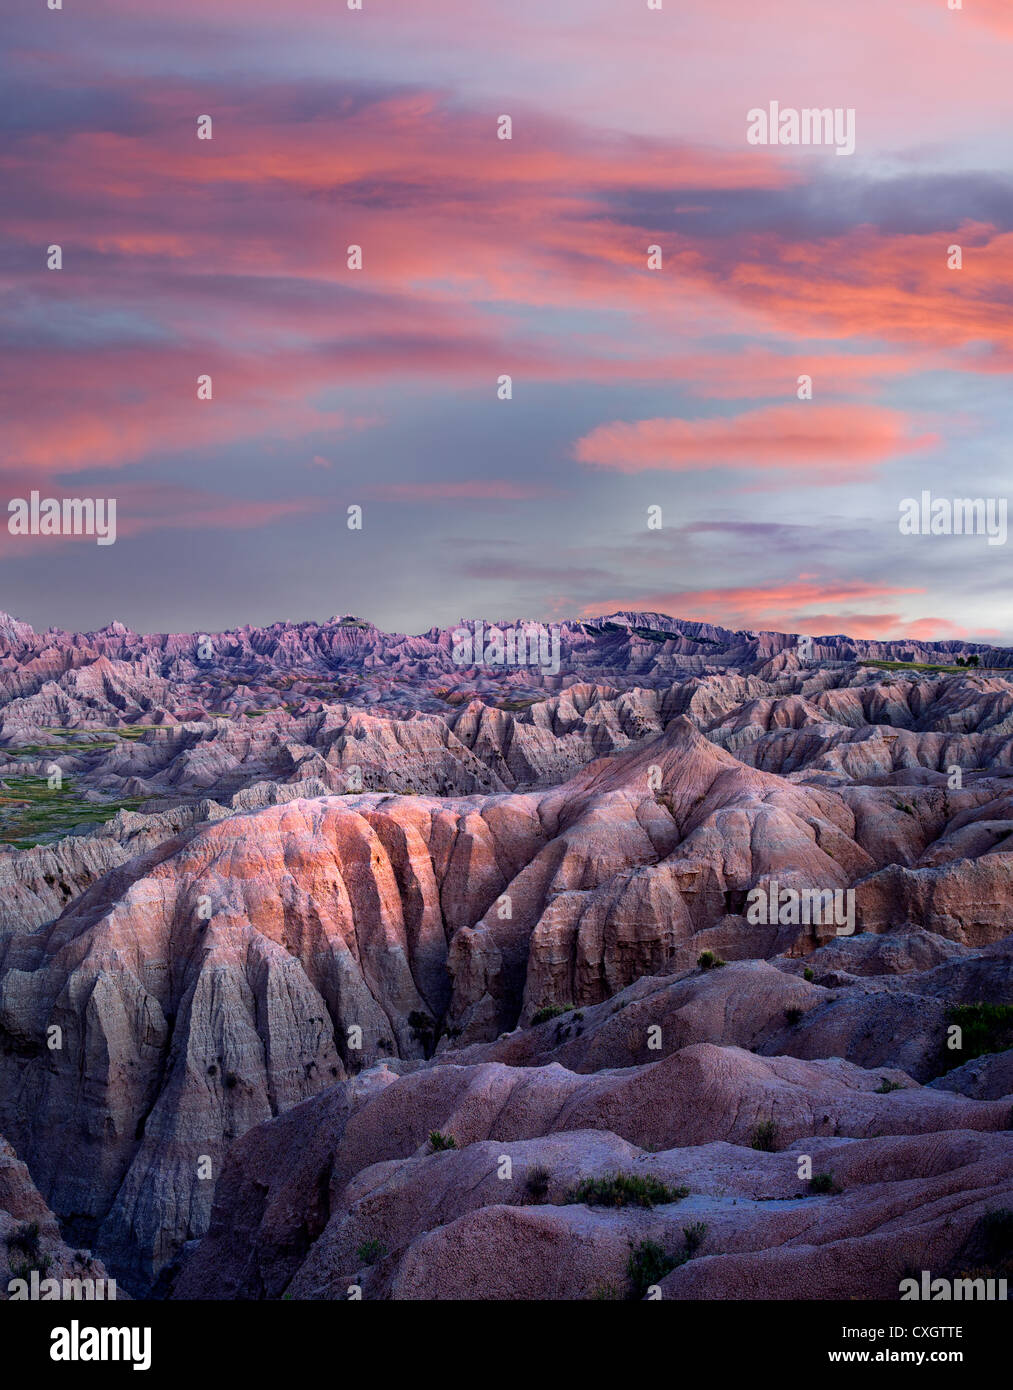 Colorful formations in Badlands National Park, South Dakota - Stock Image